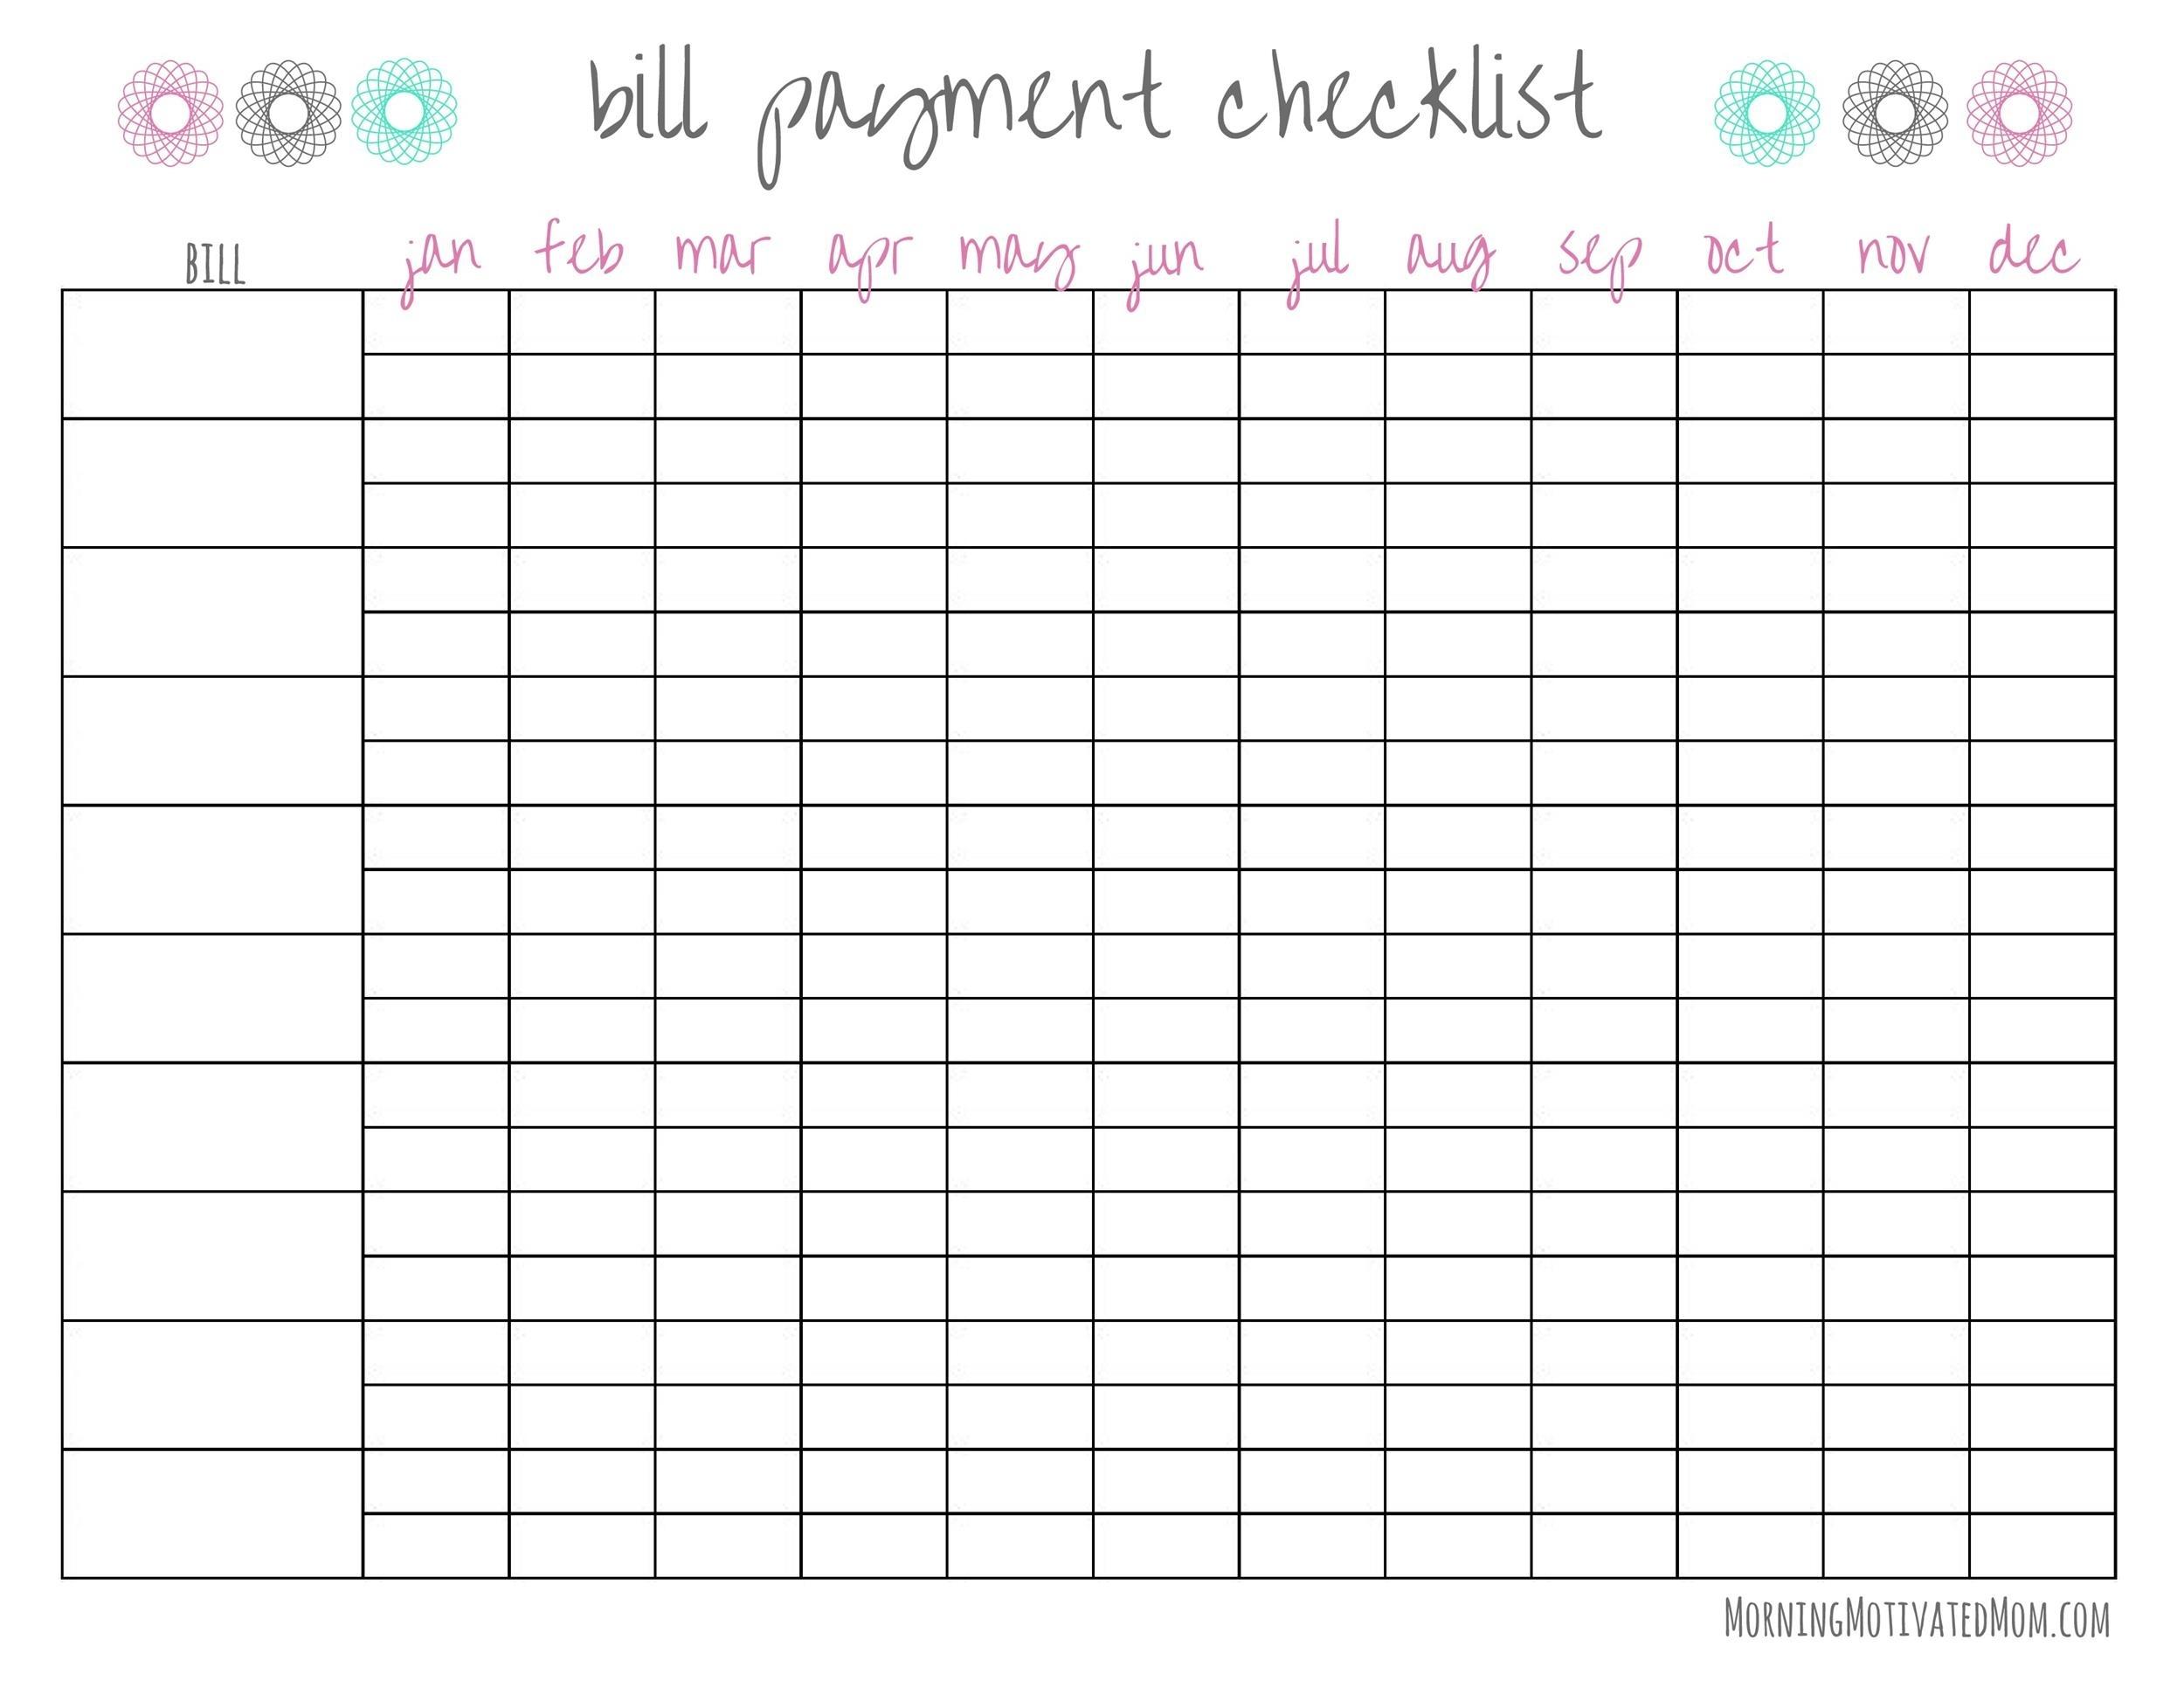 Pick Bill Payment Worksheet Printable